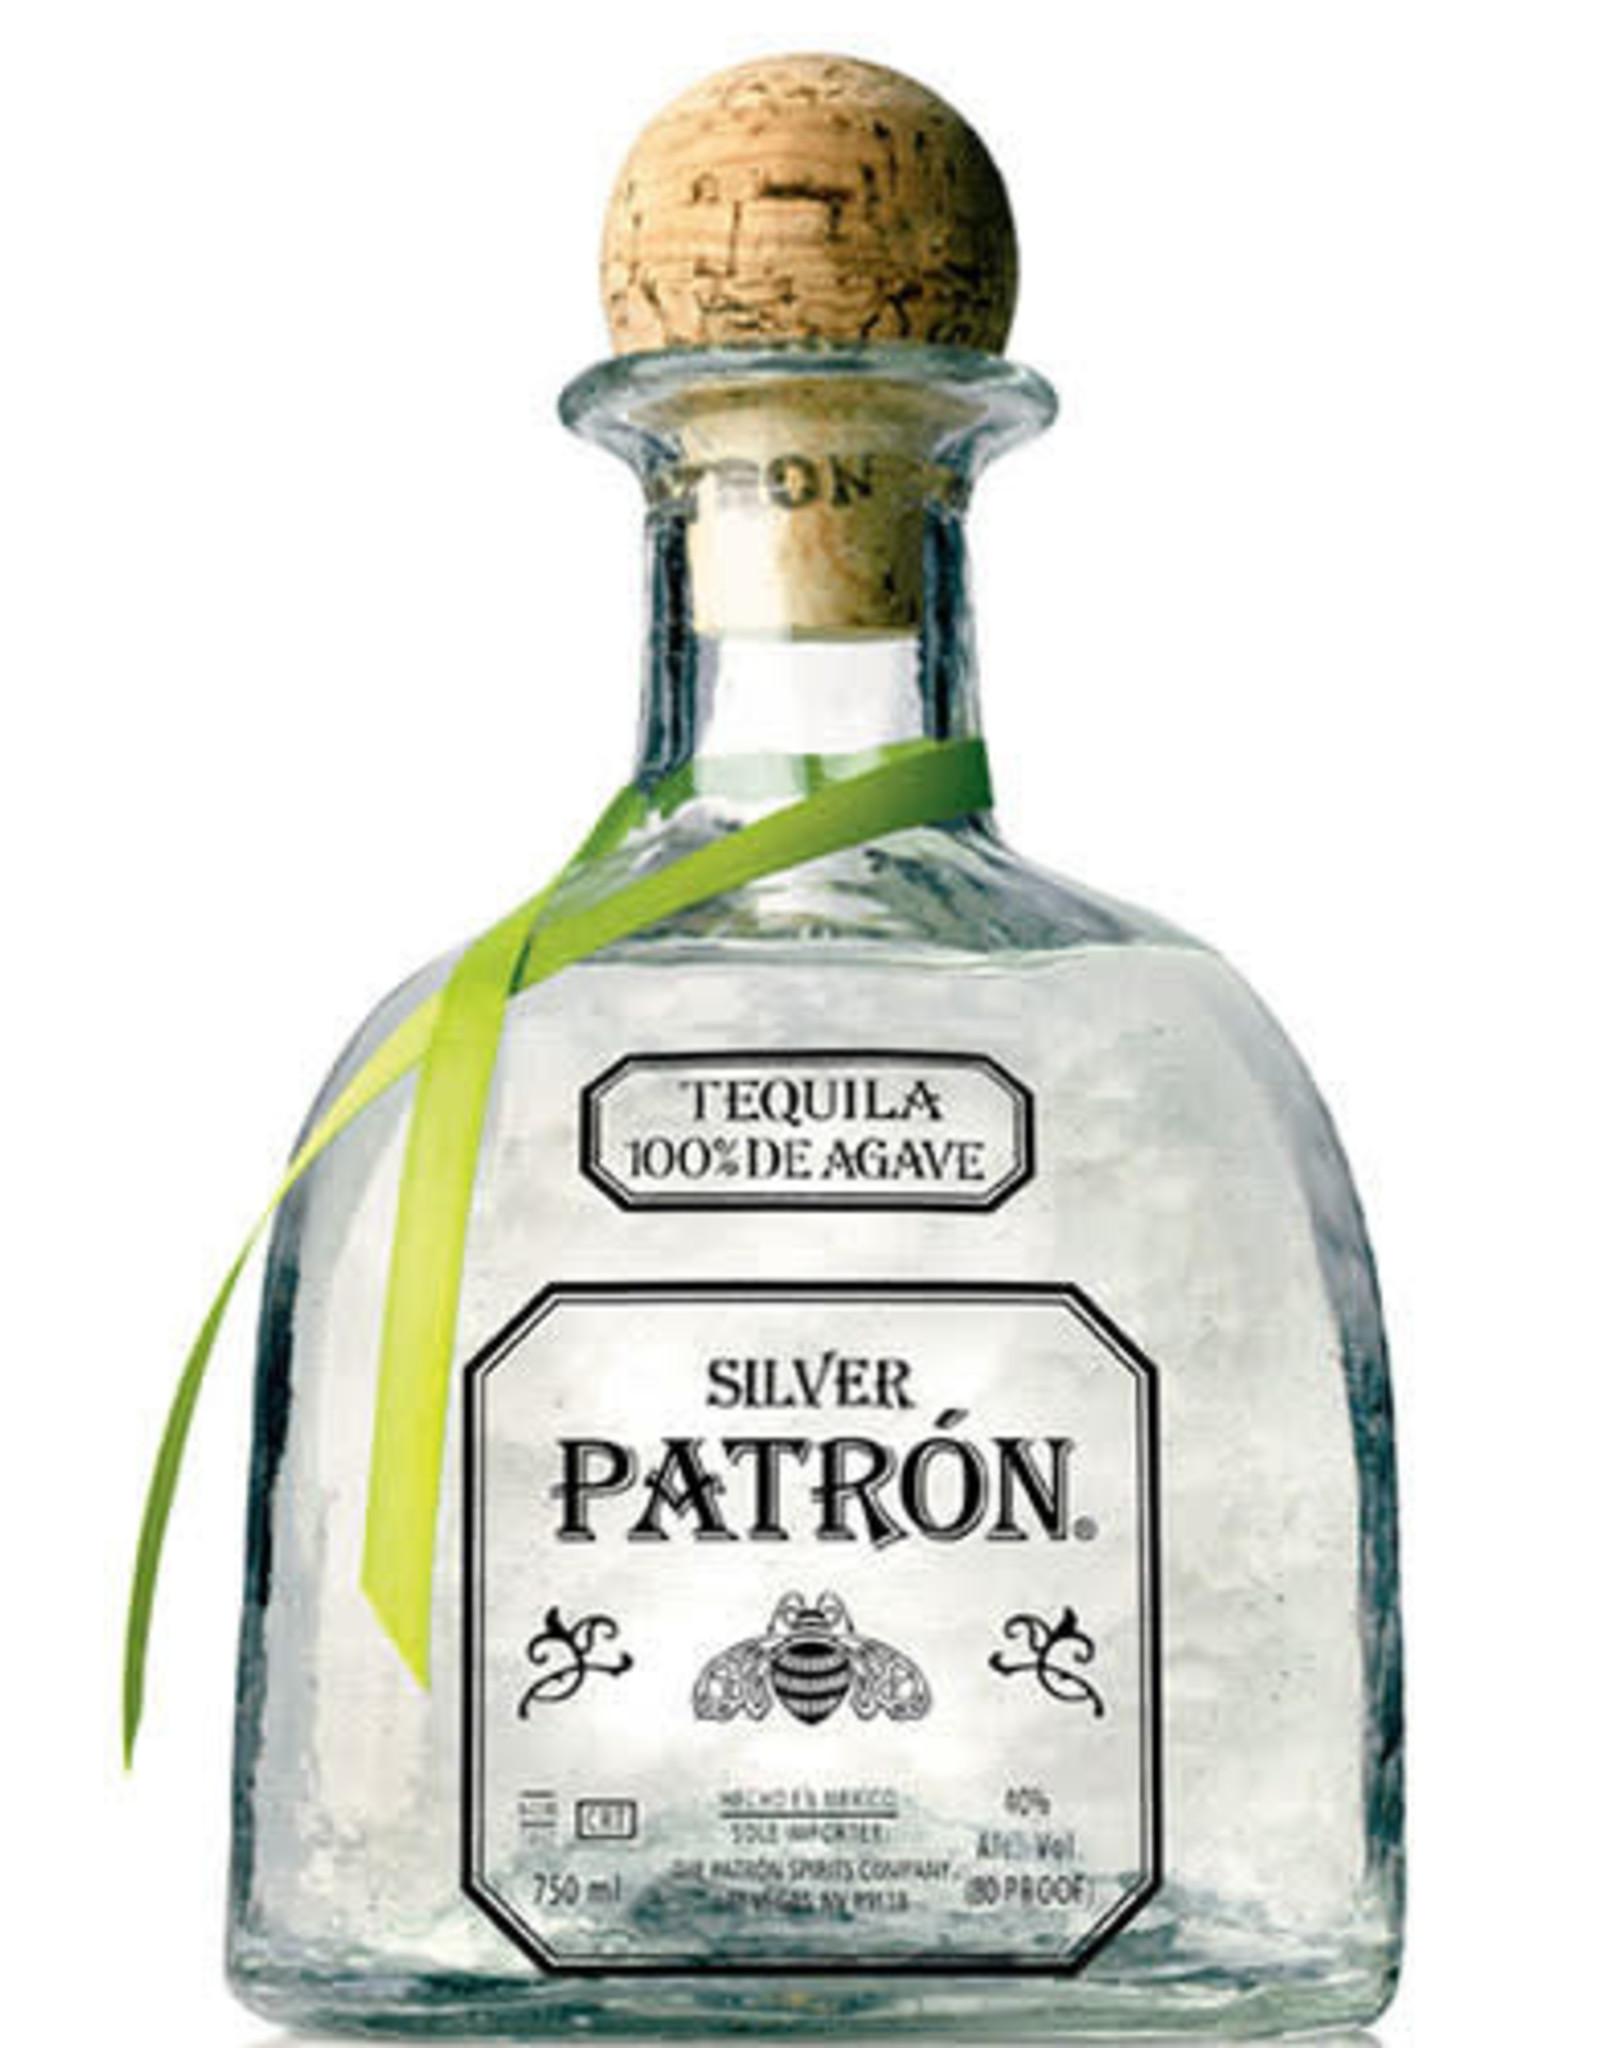 Patron Patron Tequila Silver 1.75L